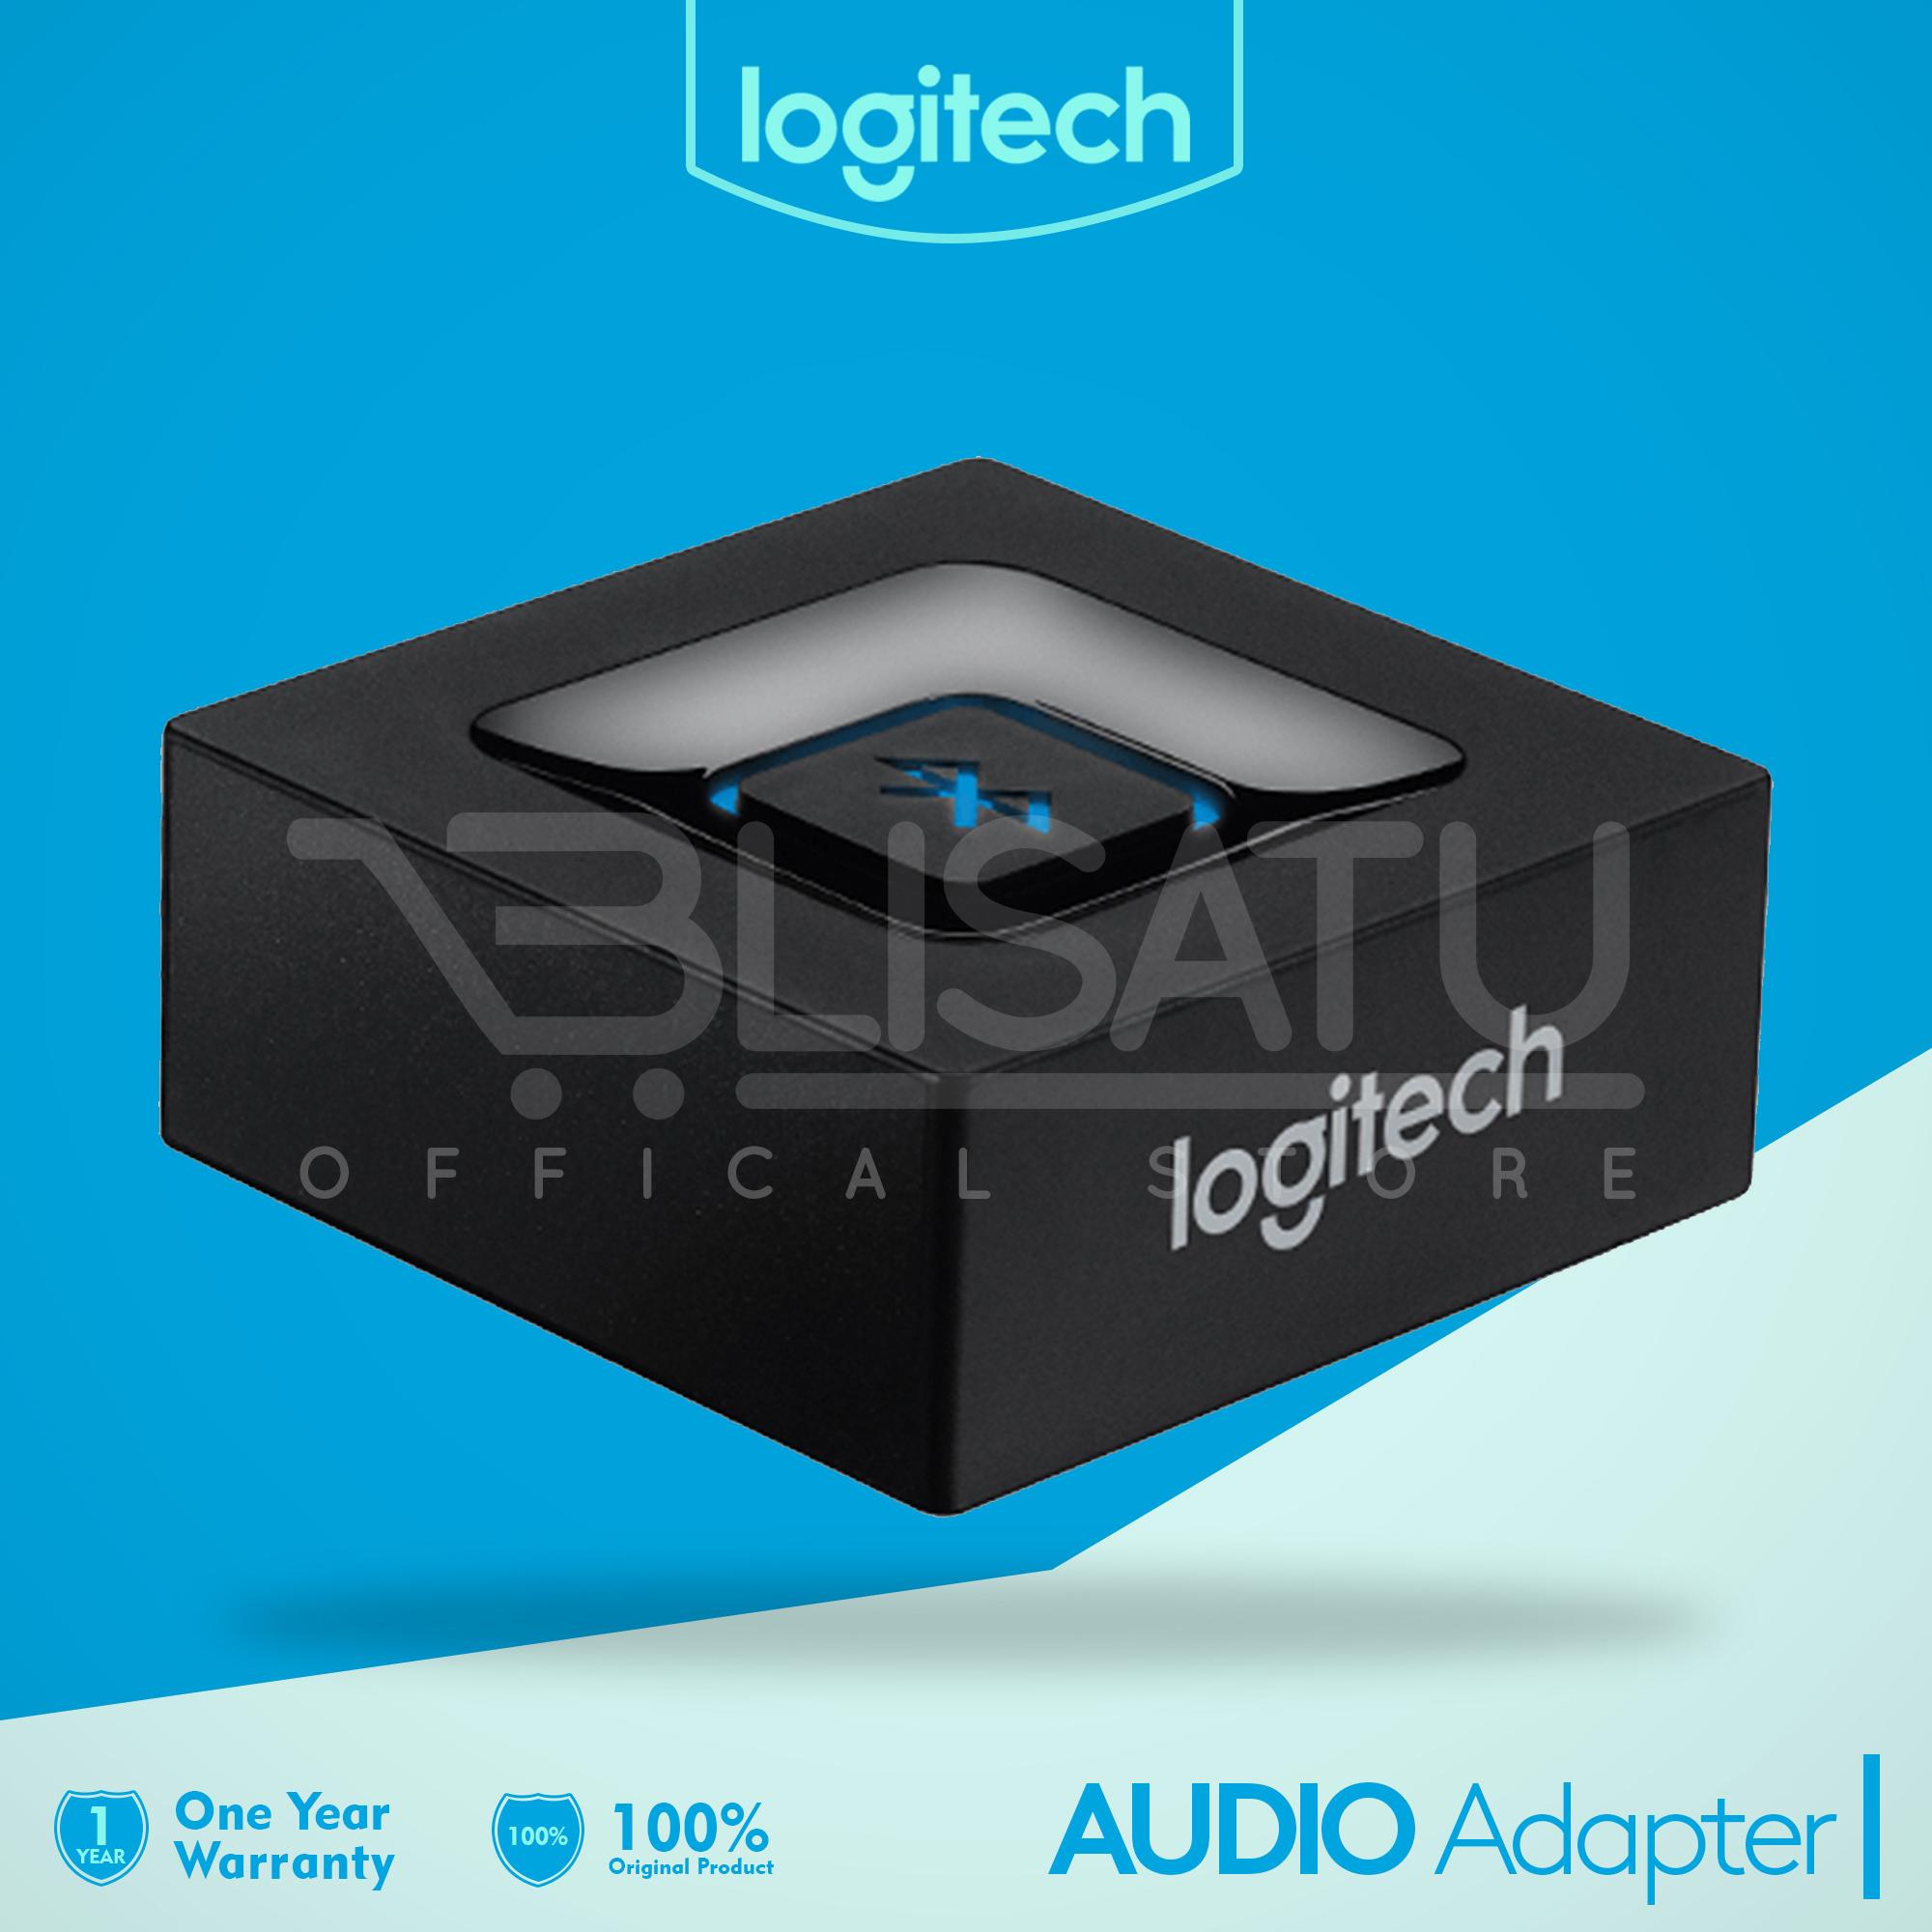 Marvo Hg9005 Gaming Headset Usb Surround 71 Hitam Cek Harga Headphone H 8631 Daftar Source Logitech Bluetooth Audio Adapter